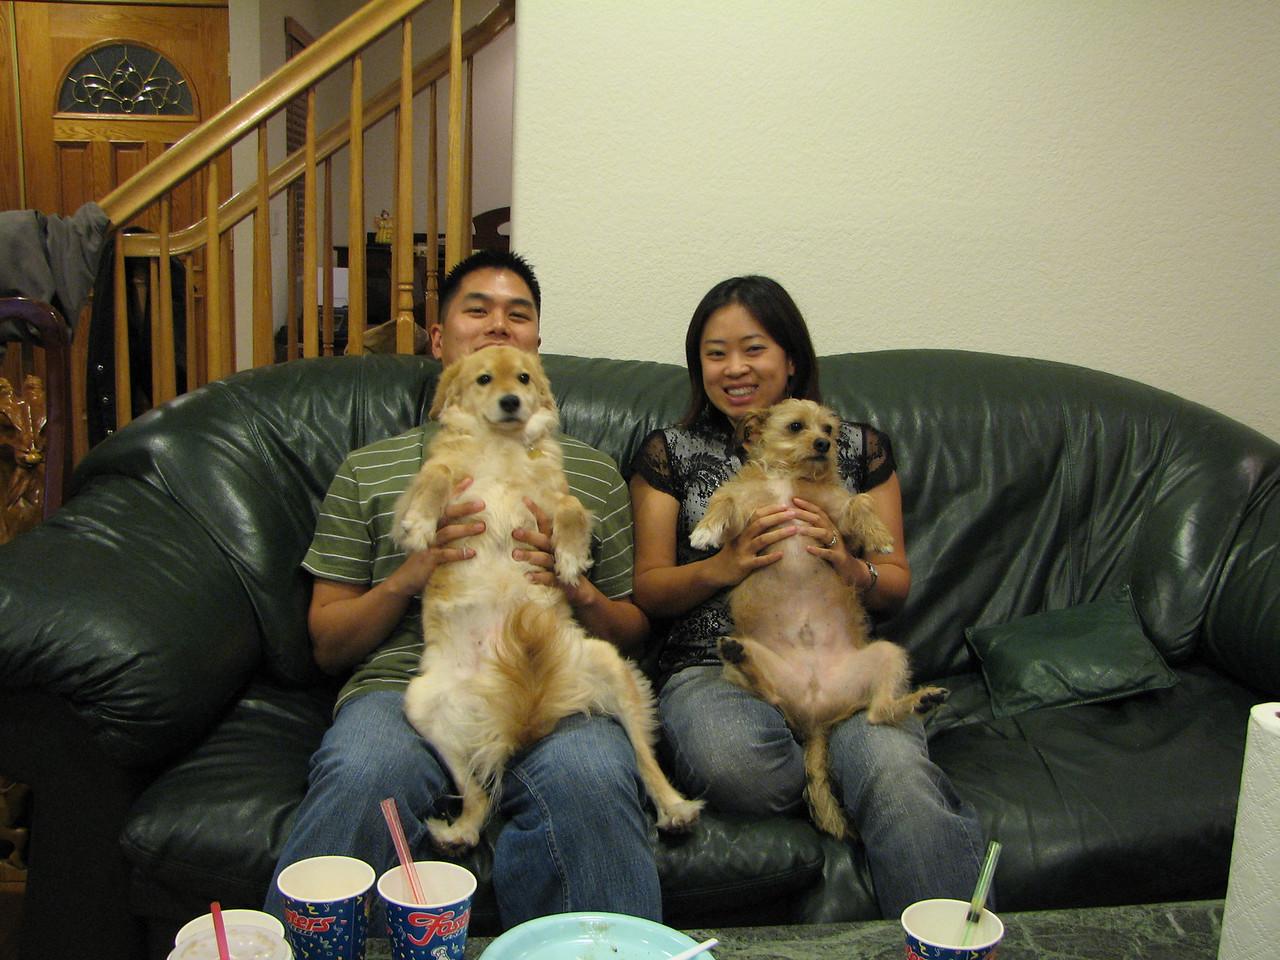 2006 11 23 Thu - Johnny, Julie, Lady, & Benji Chen